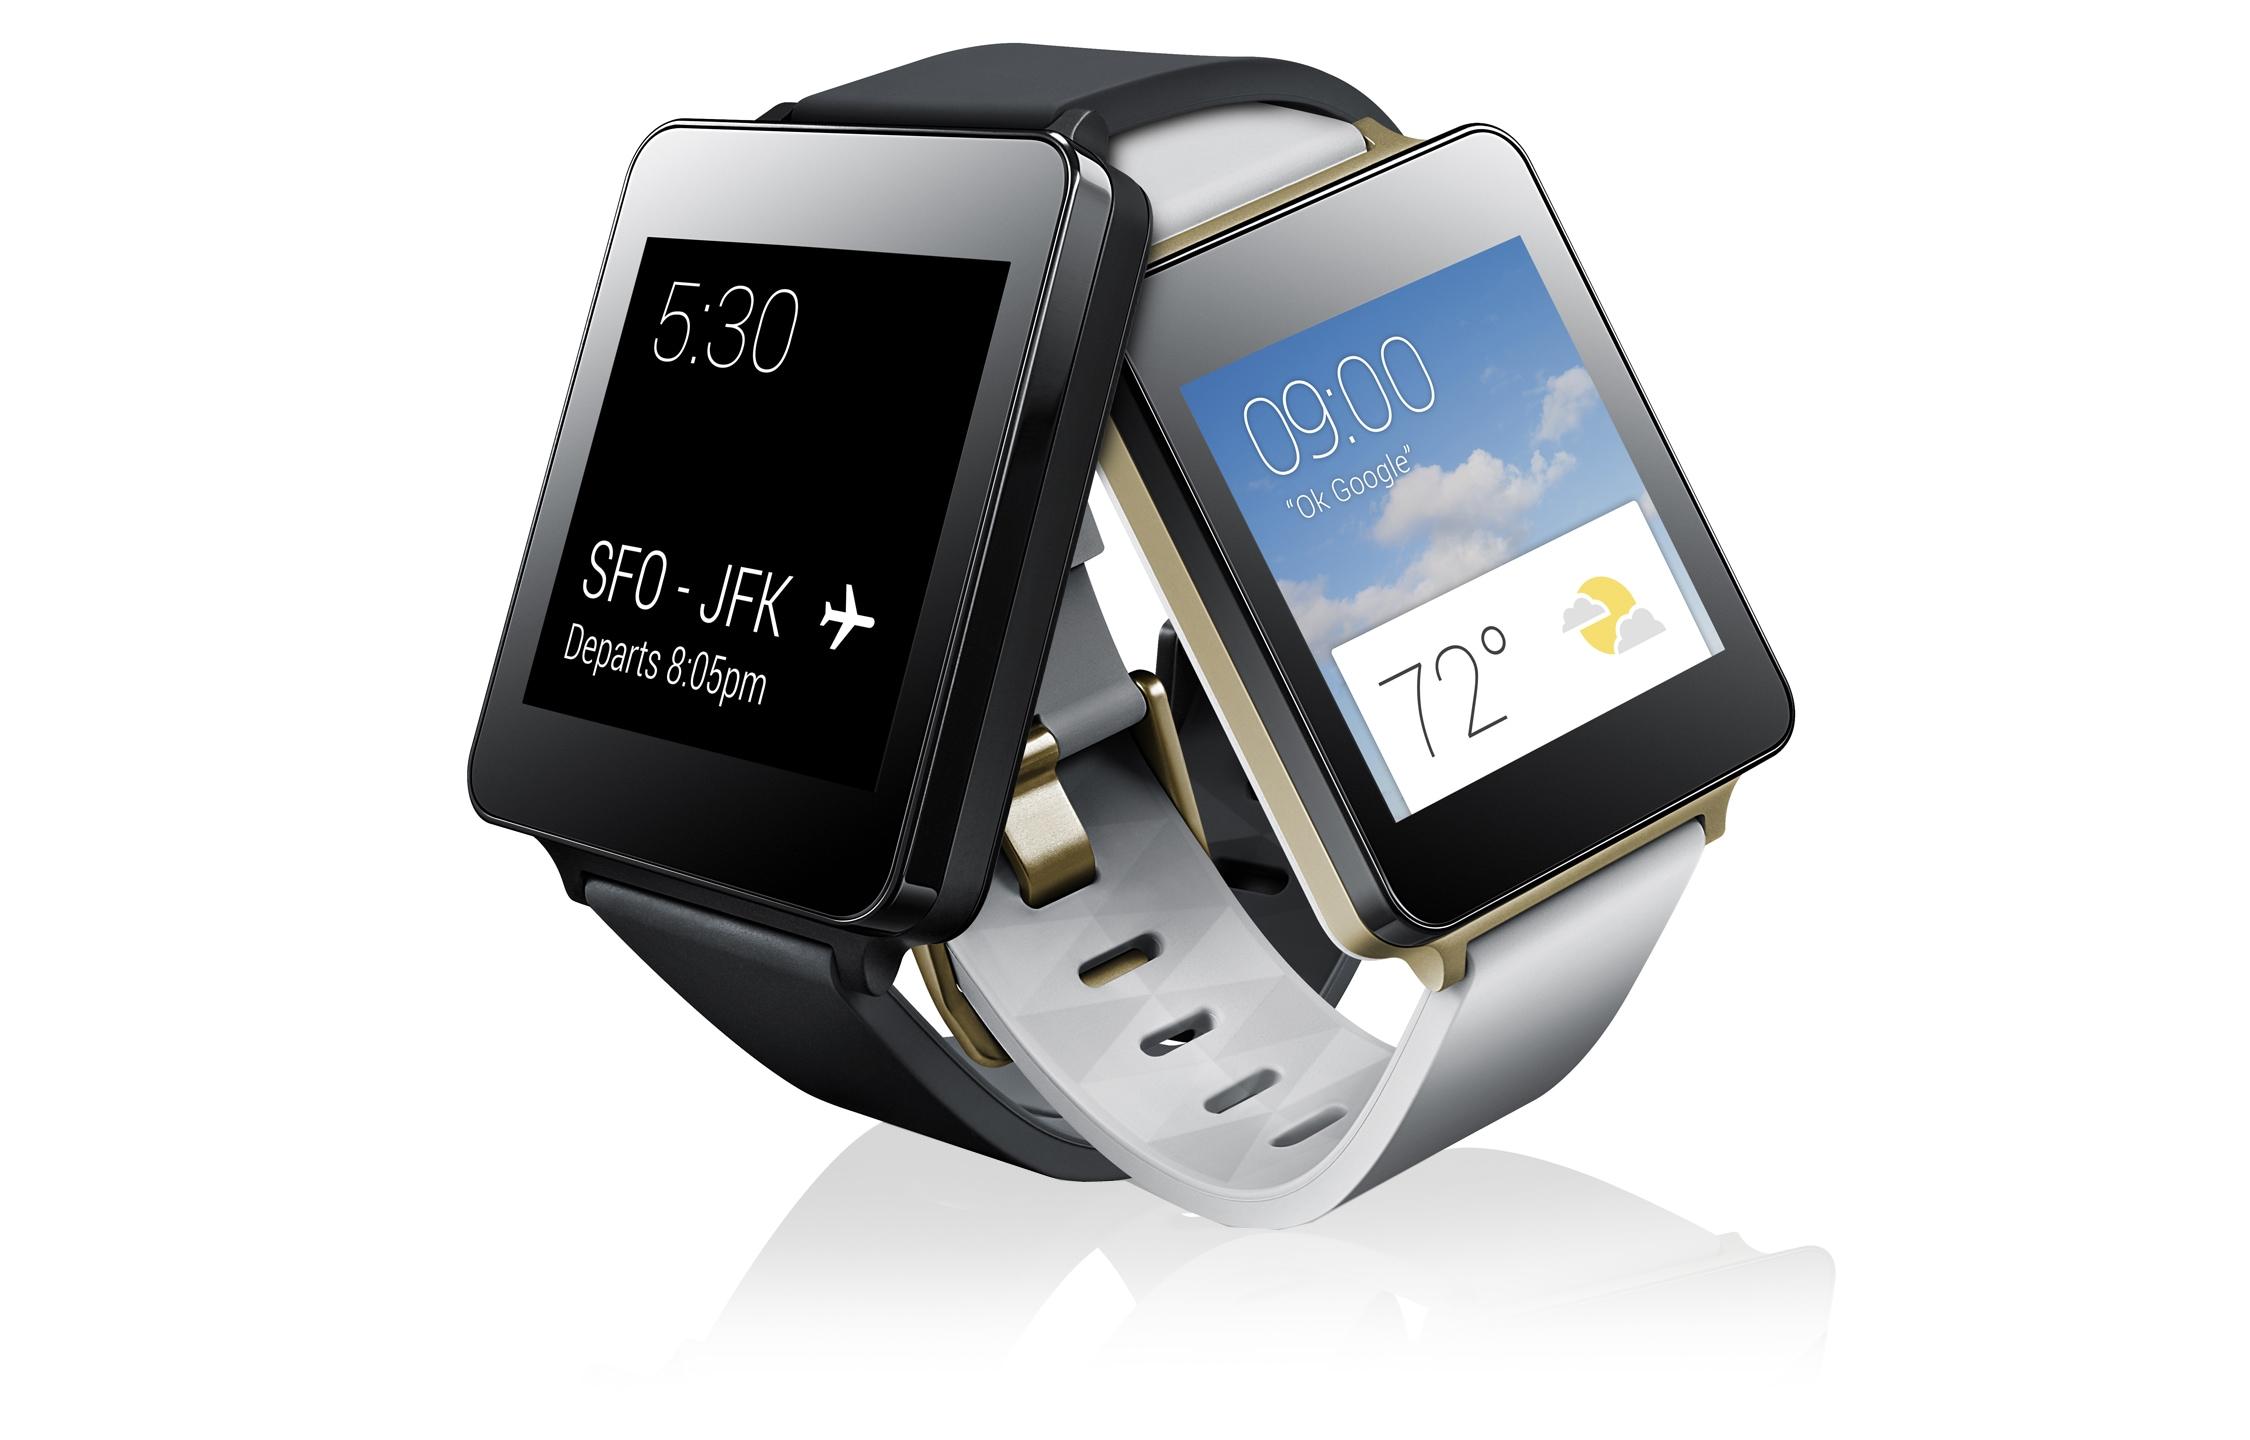 lg g watch r2_lg g watch w100中文_lg g watch urbane